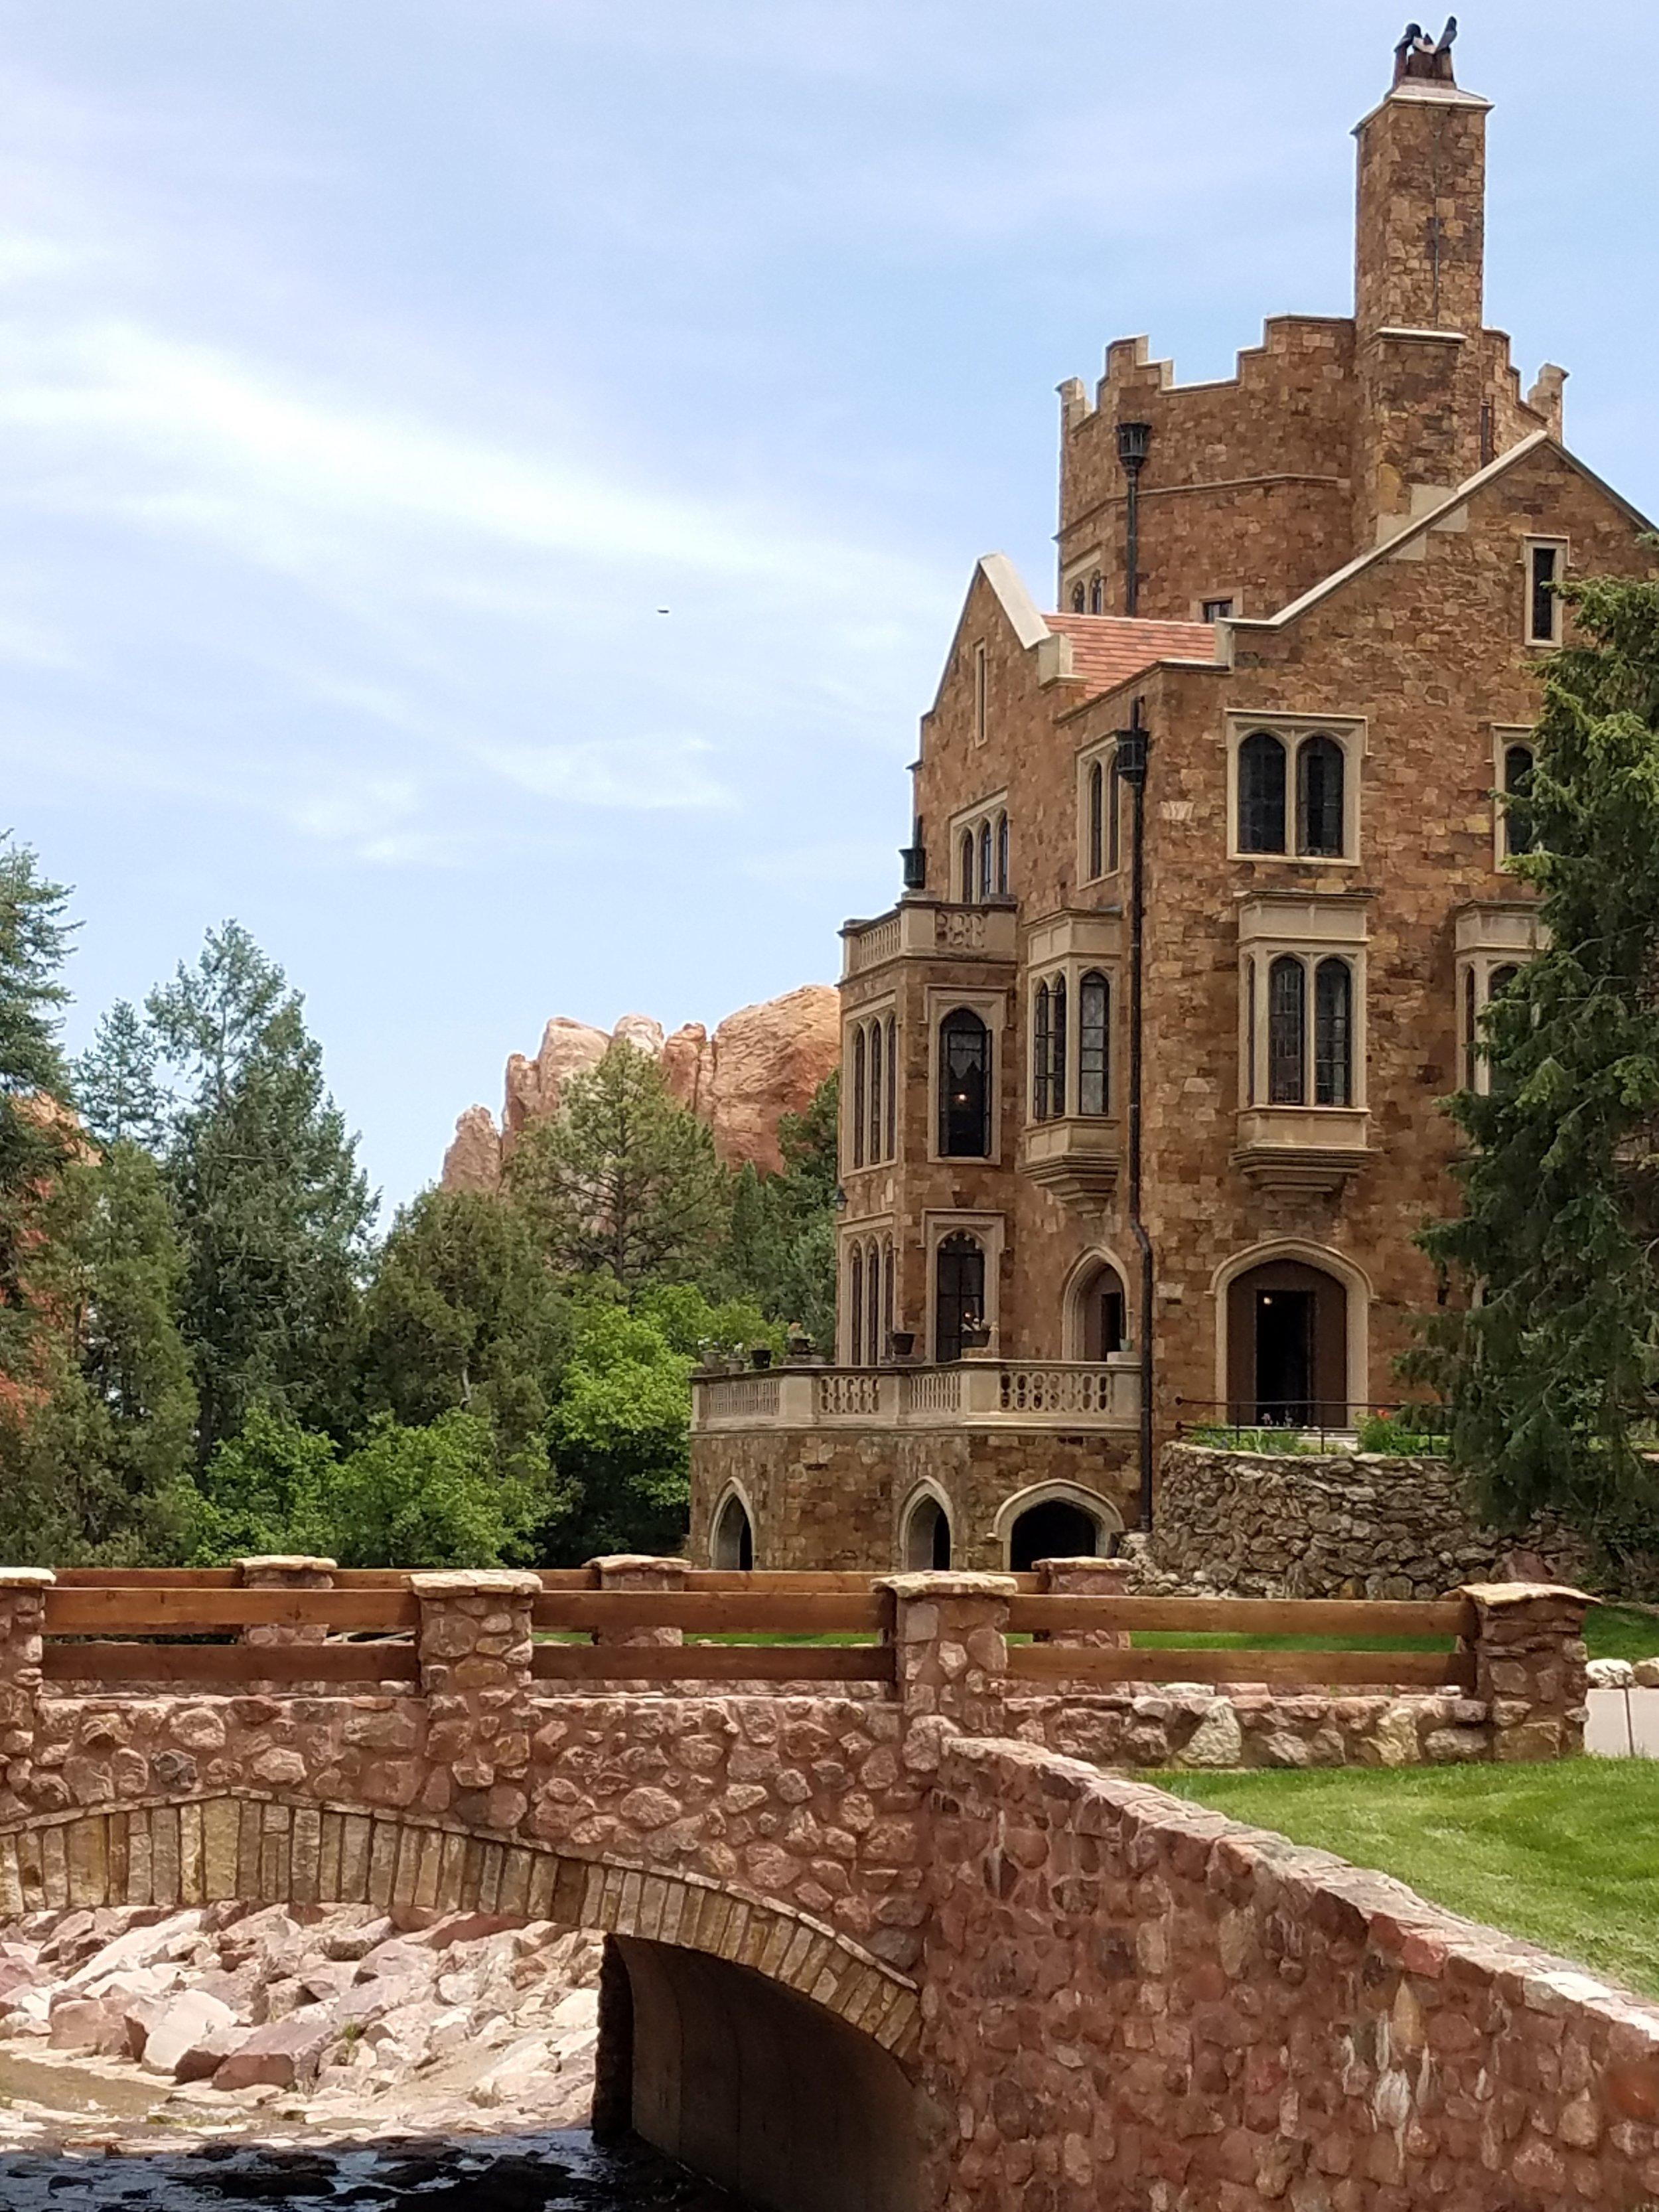 Nov. 4-5, 2017Devoted Dreamers Retreat - Glen Eyrie Conference Center, Colorado Springs